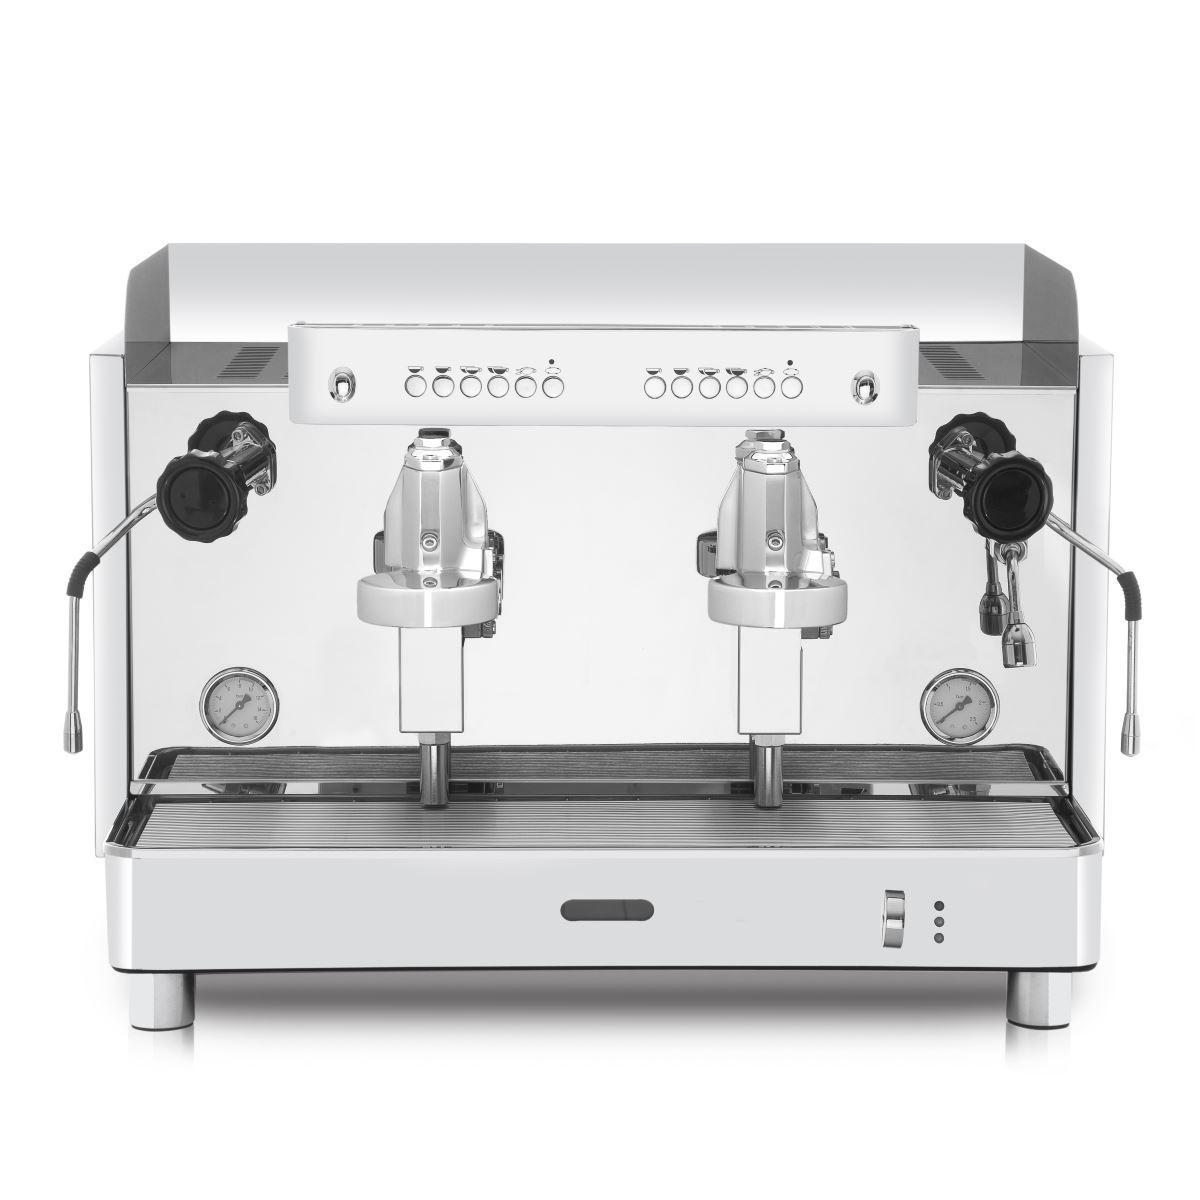 Espressor profesional Vibiemme Replica 2B Elettronica, 2 grupuri